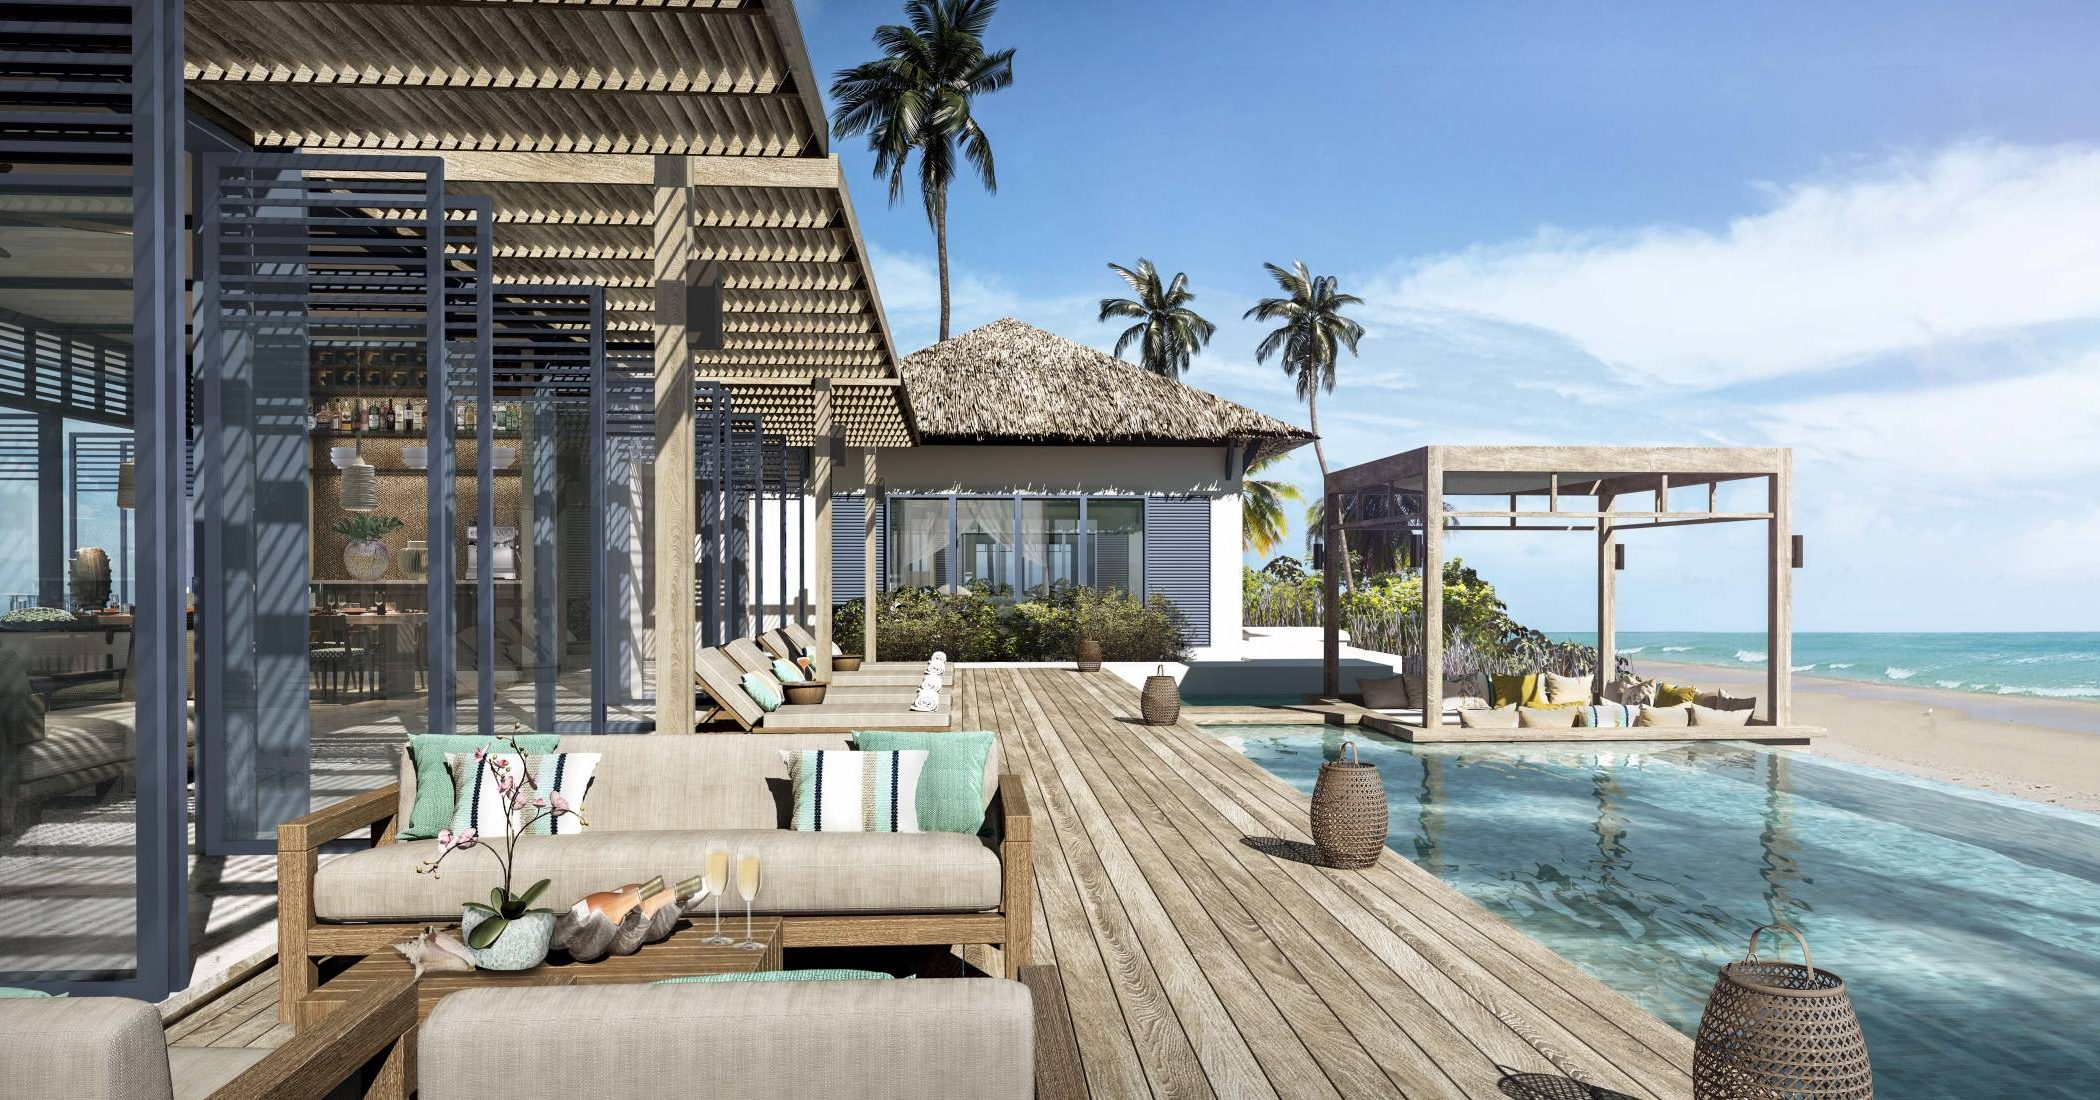 Raffles Maldives Meradhoo - Raffles Royal Residence